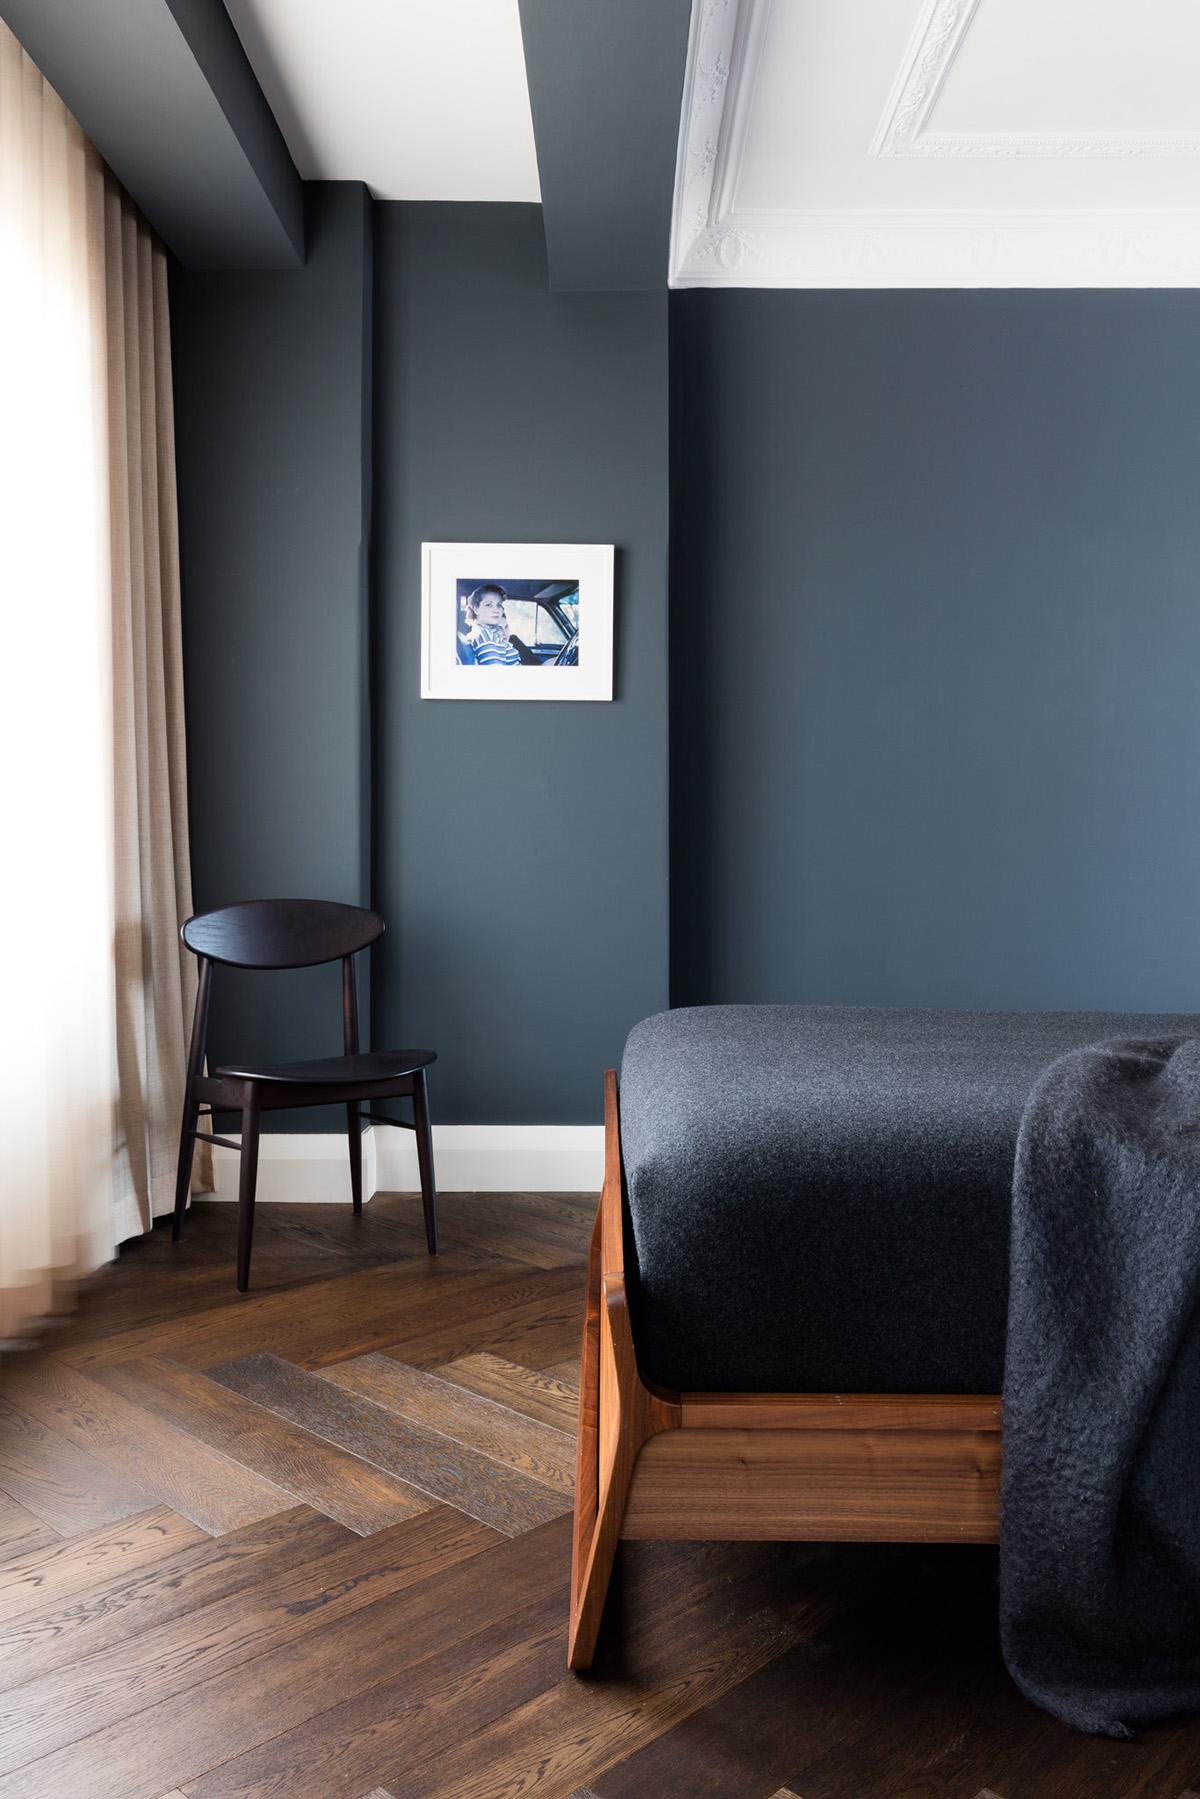 visgraat-houten-vloer-slaapkamer